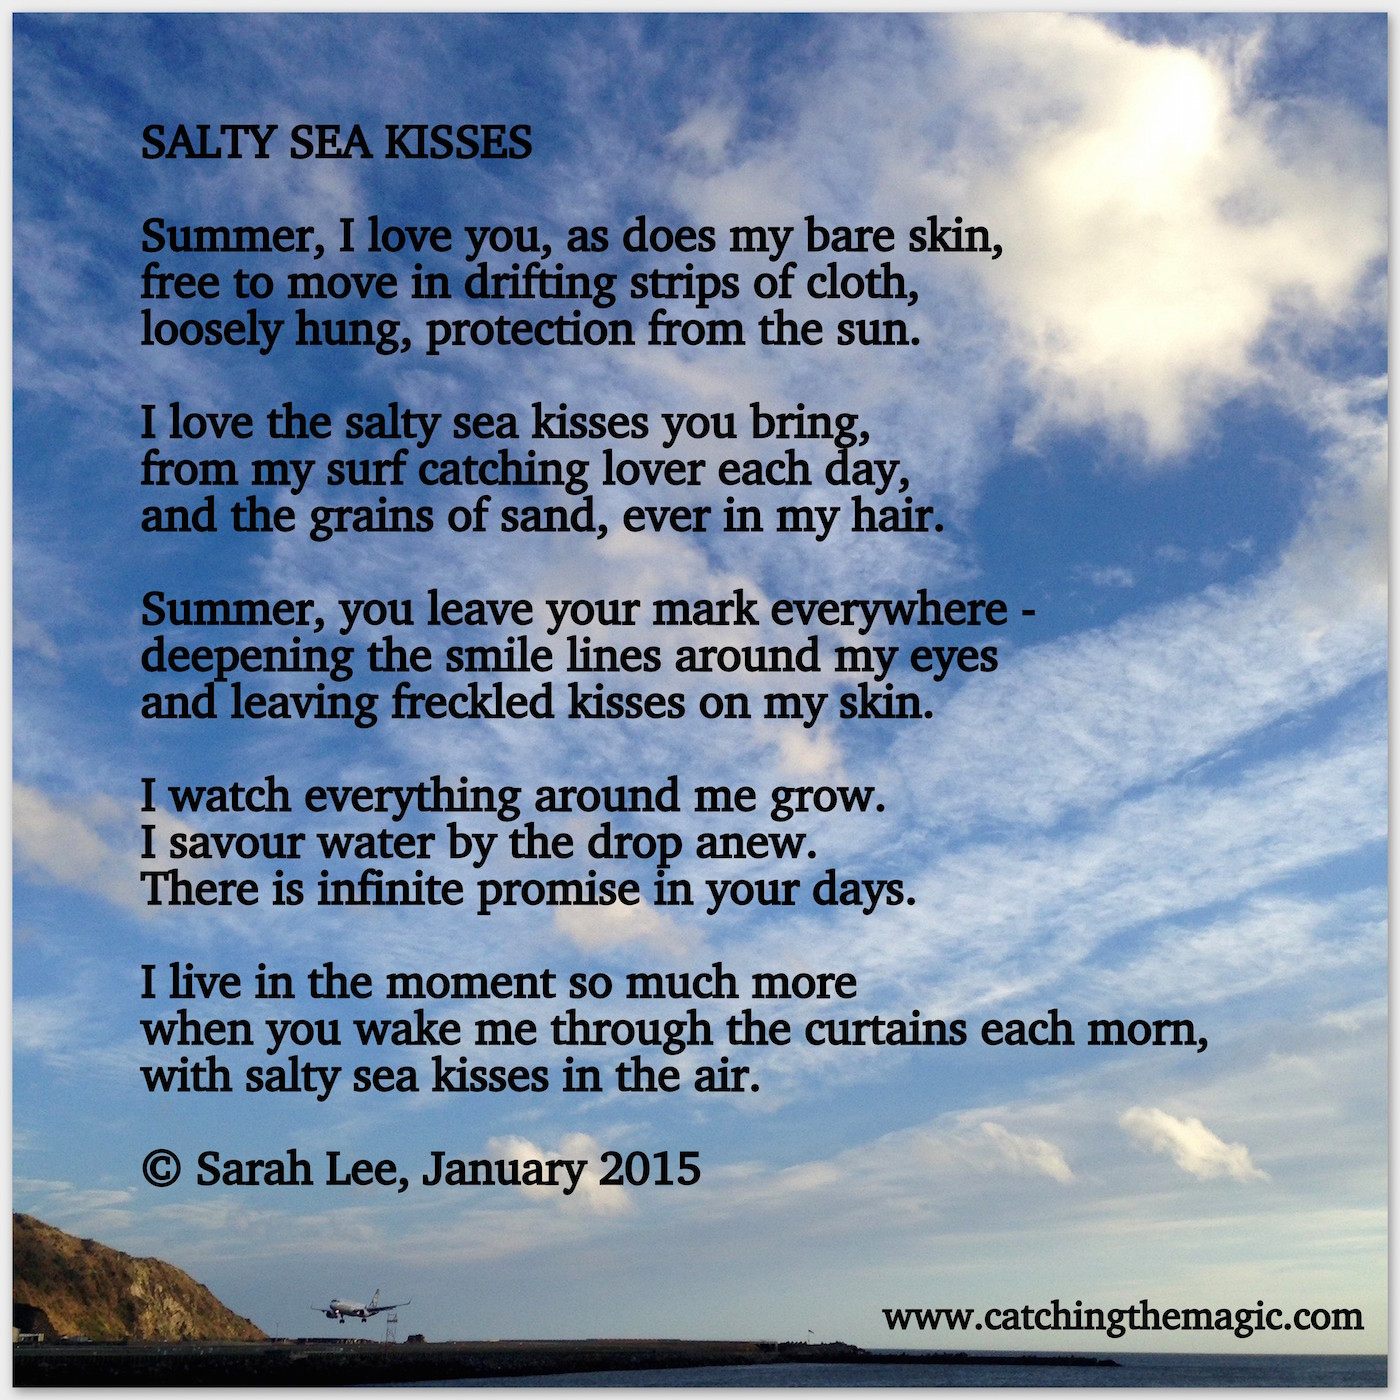 Salty Sea Kisses A Poem